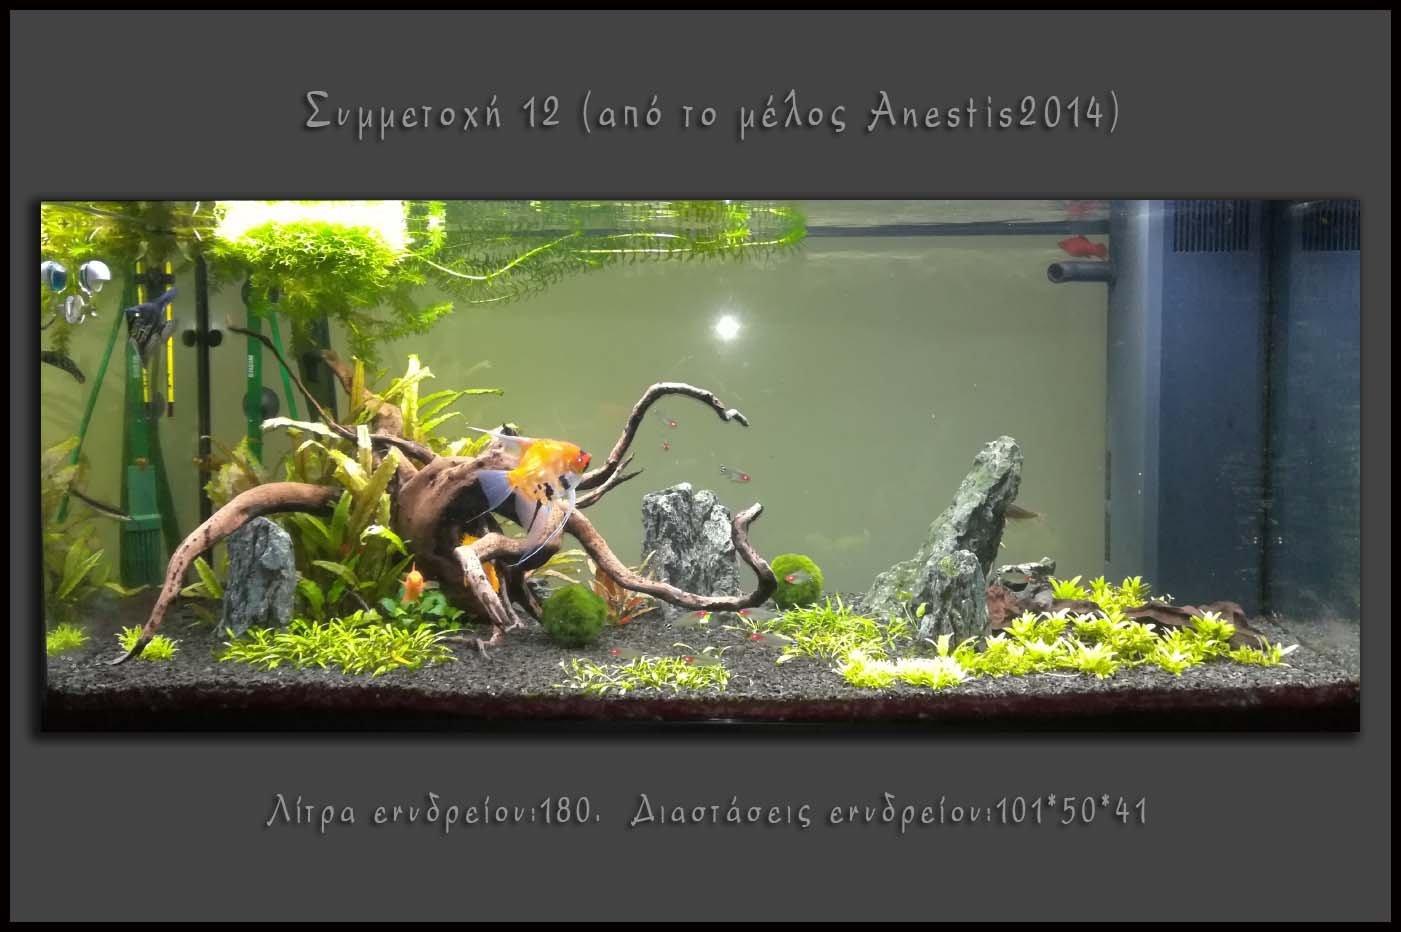 anestis2014